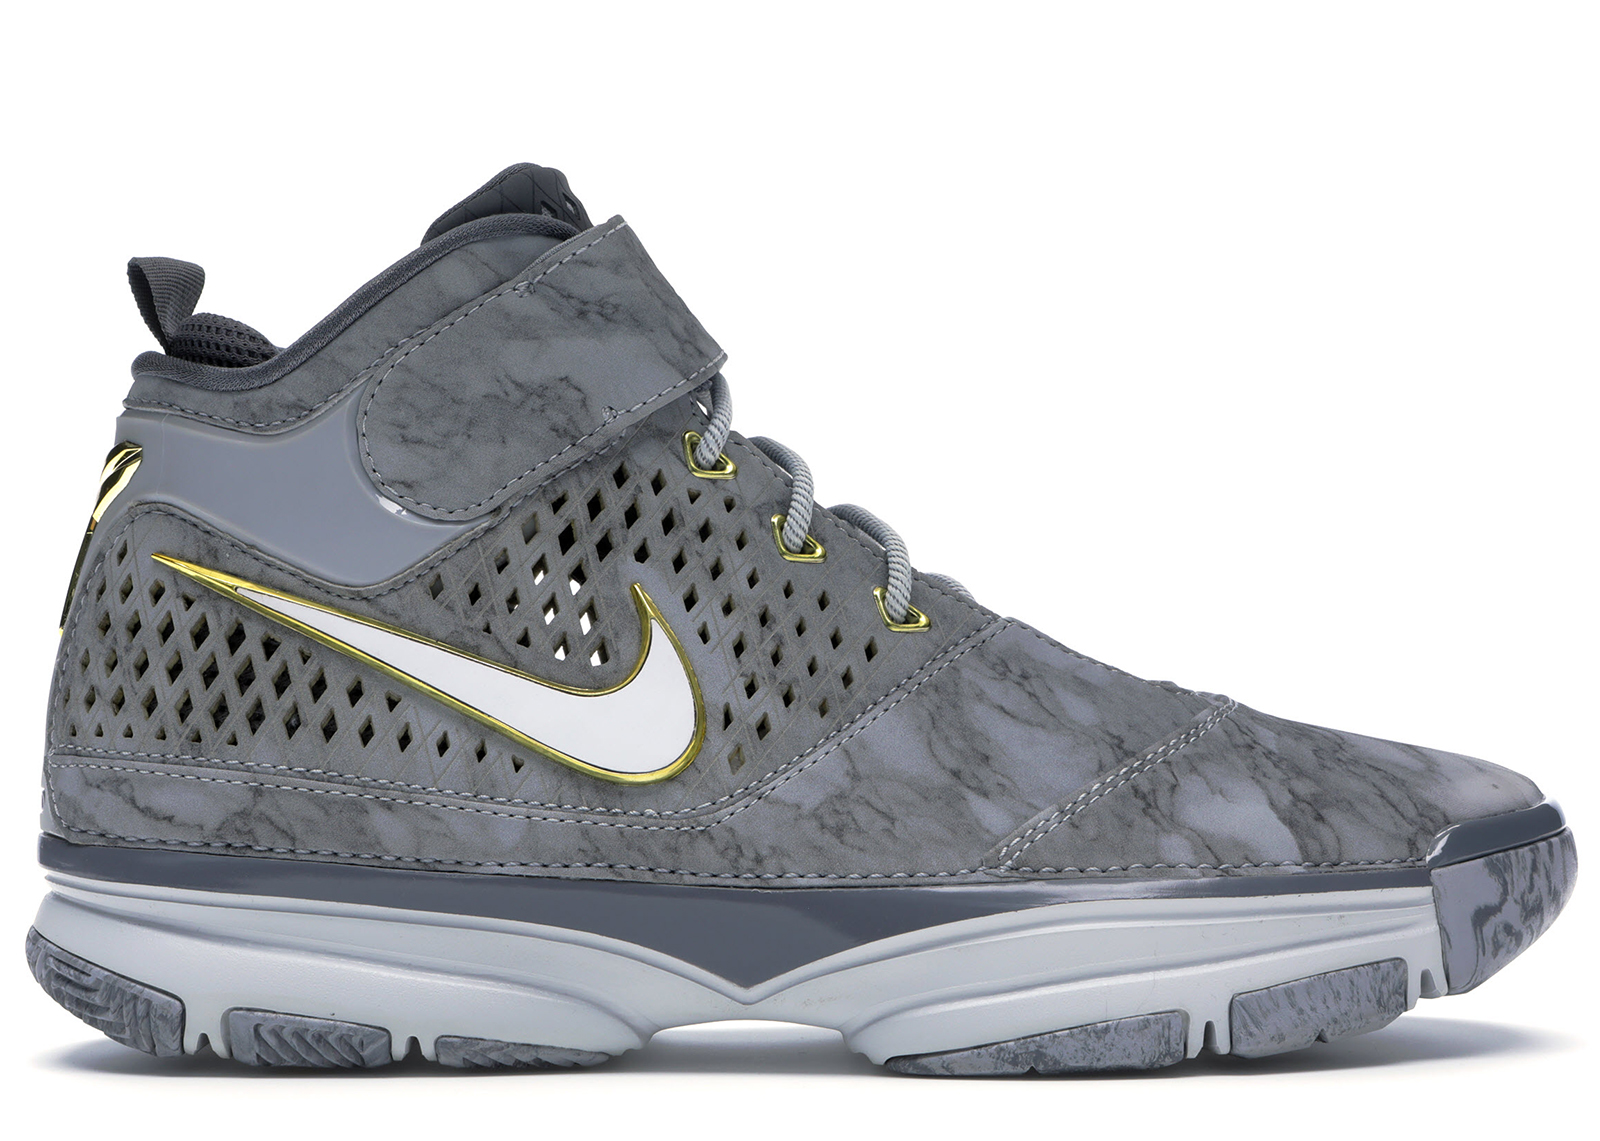 Nike Kobe 2 Prelude (4/50+ Points